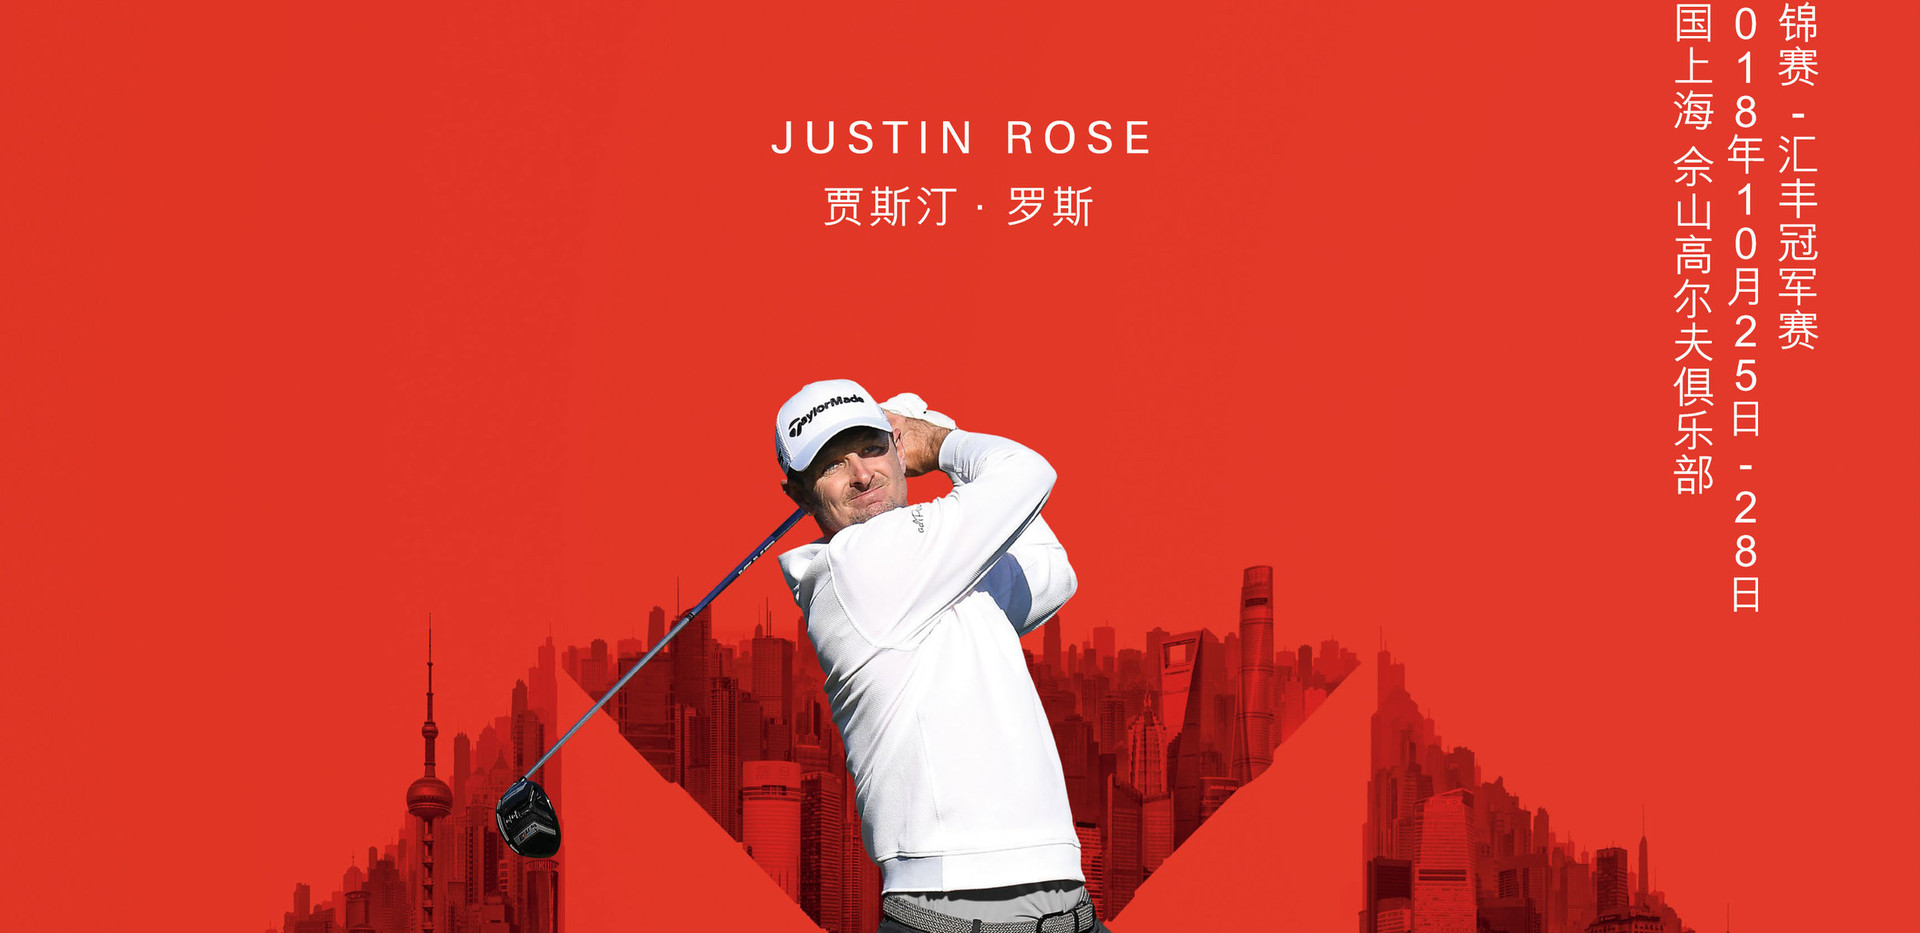 0117_HSBC_China_Golf_6sheet_JUSTIN-2 (2)